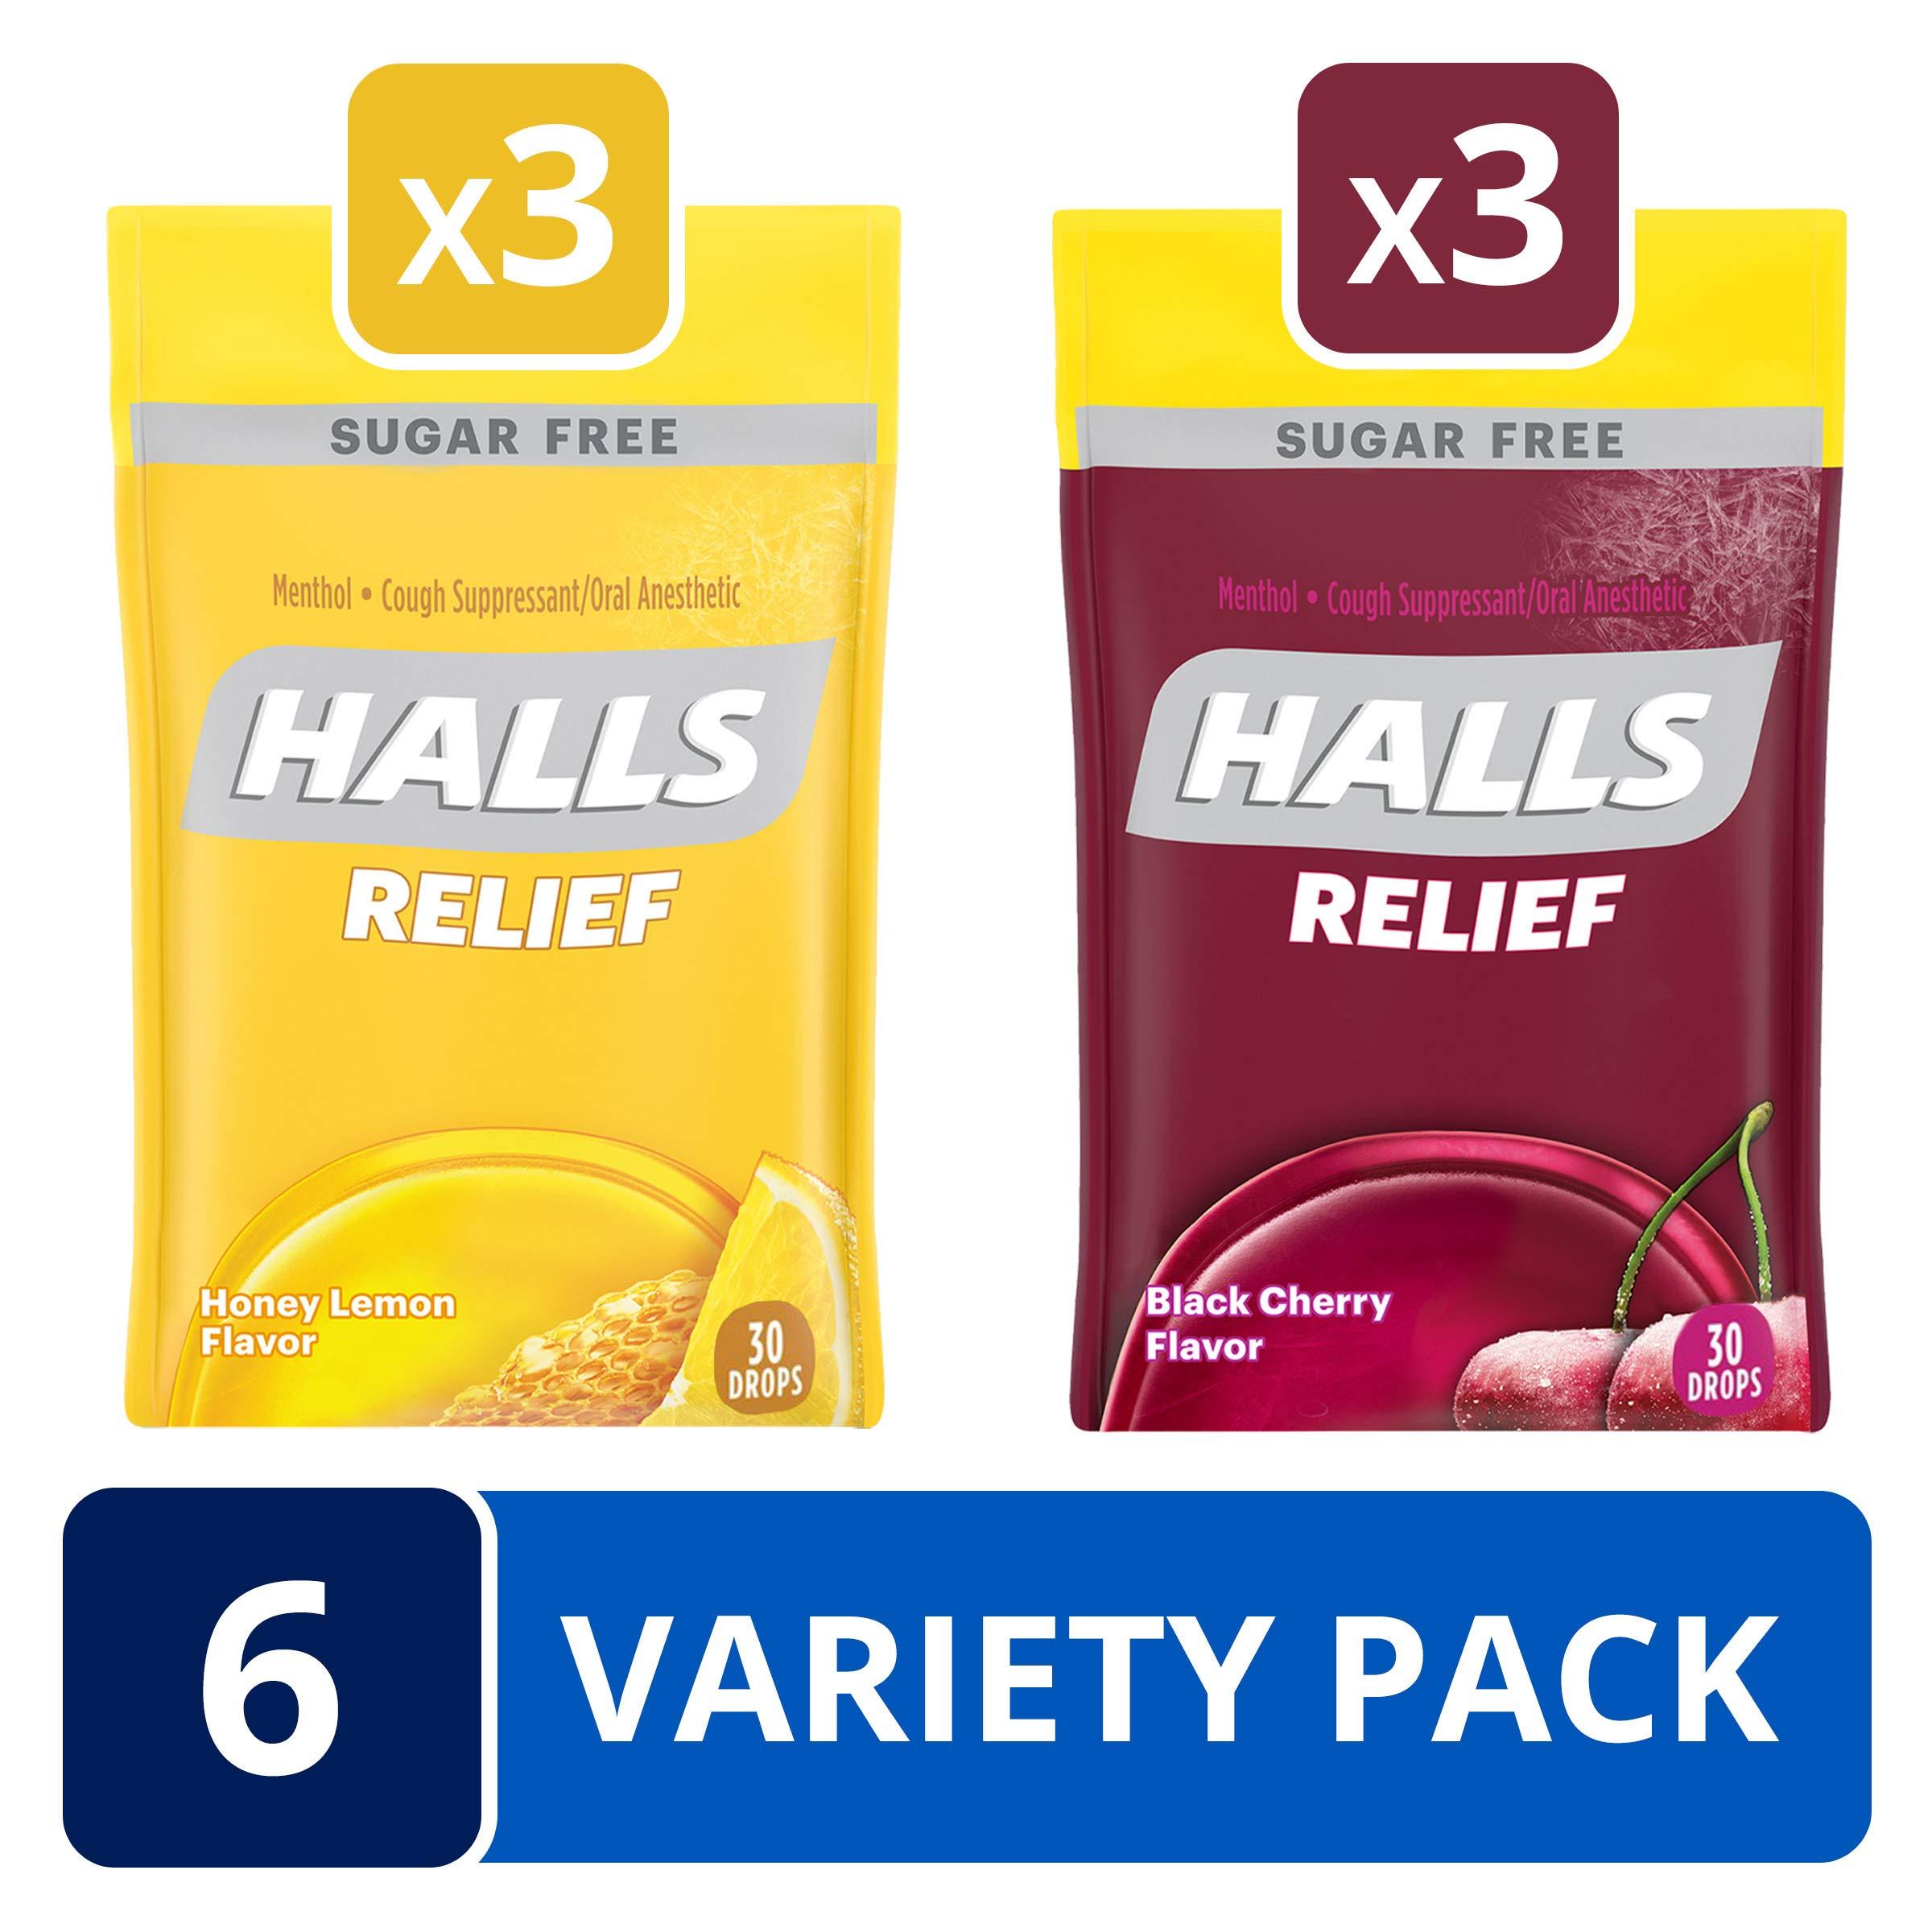 HALLS Sugar Free Cough Drops Honey Lemon & Black Cherry Variety Pack - 150 total drops by Halls